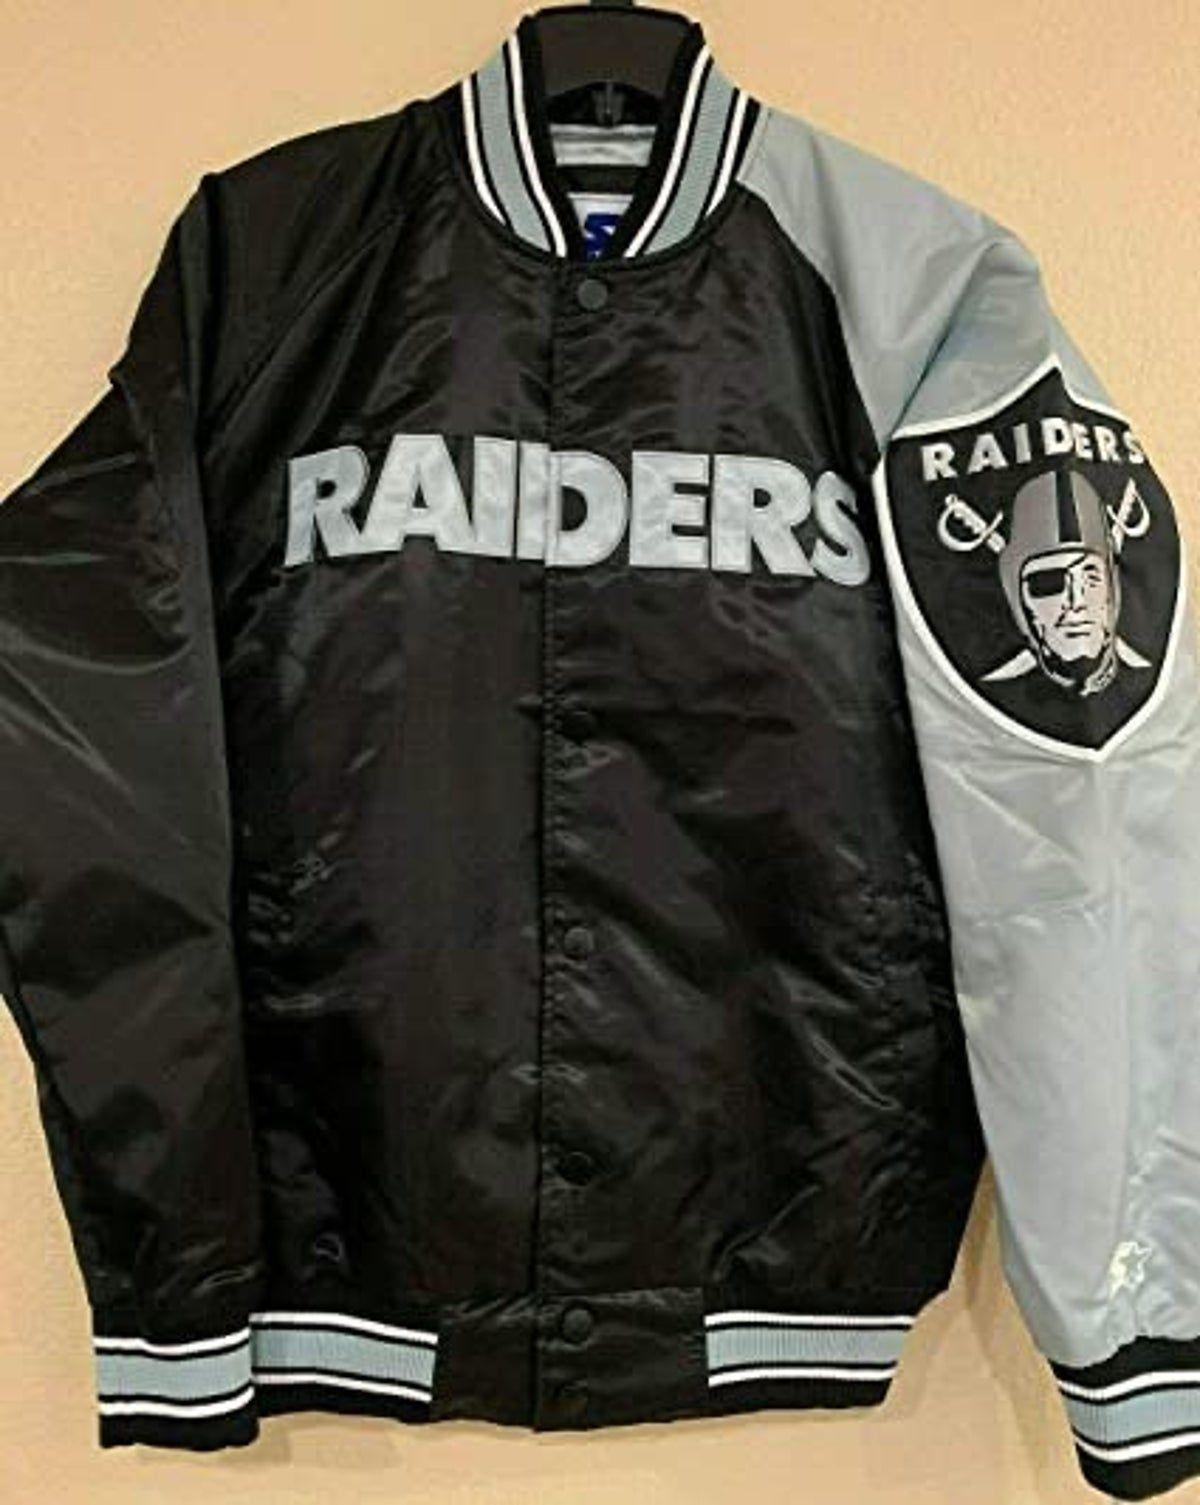 Jacket Jackets Oakland Raiders Shoes Raiders [ 1505 x 1200 Pixel ]